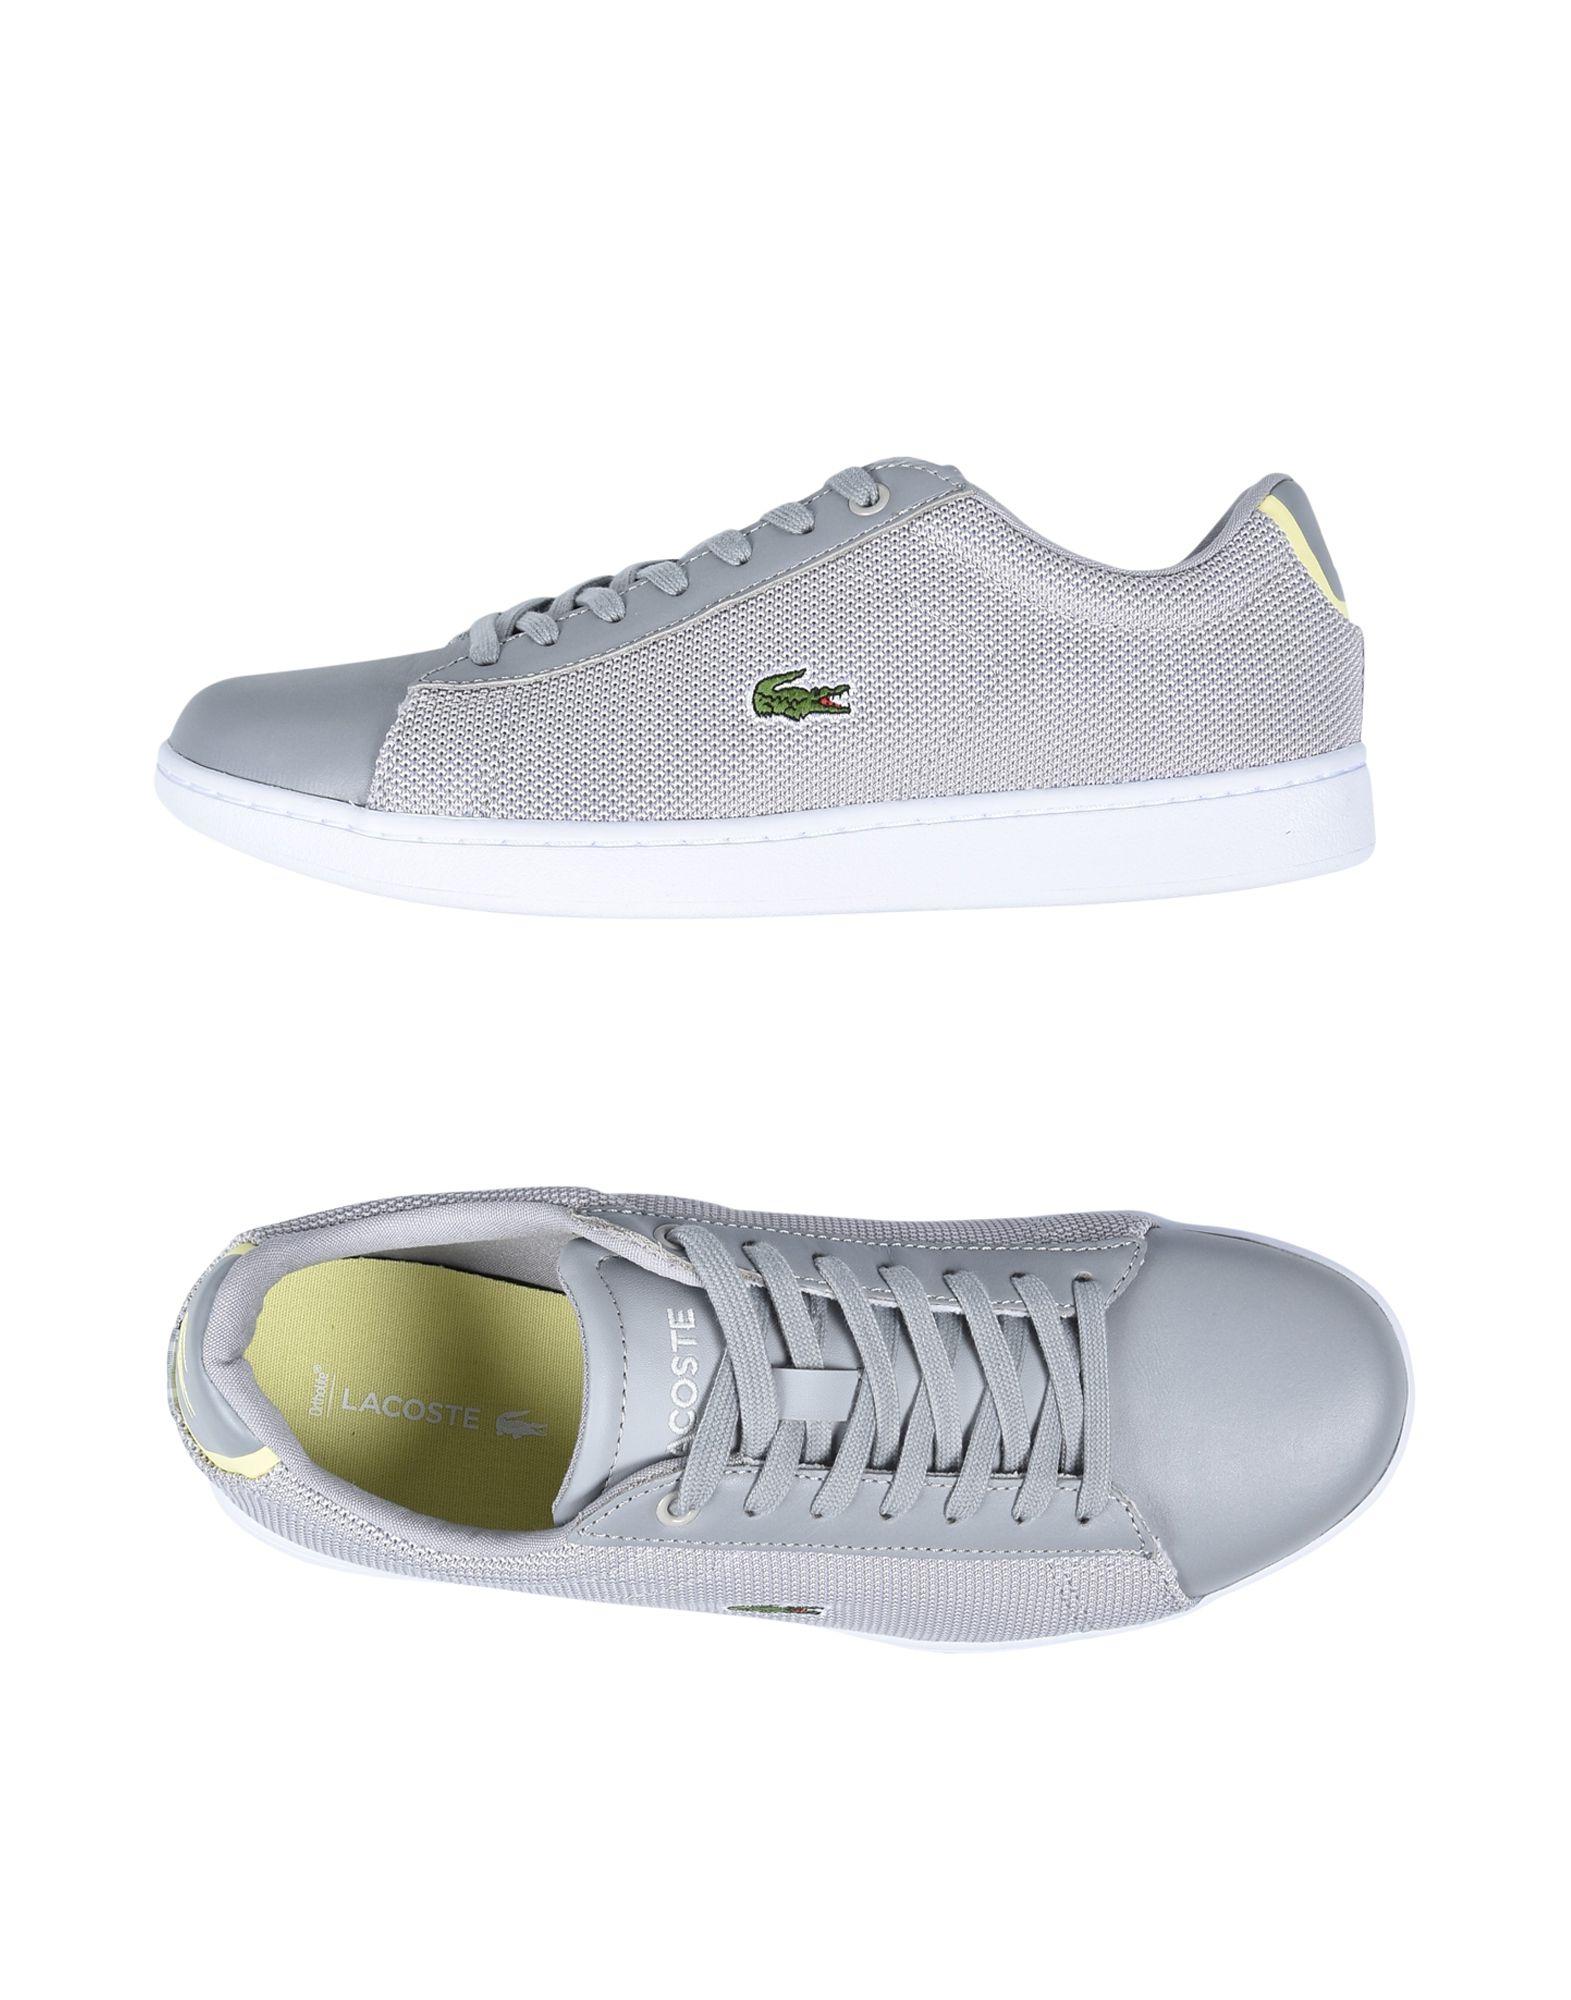 Sneakers Lacoste Carnaby Evo 117 1 - Femme - Sneakers Lacoste sur